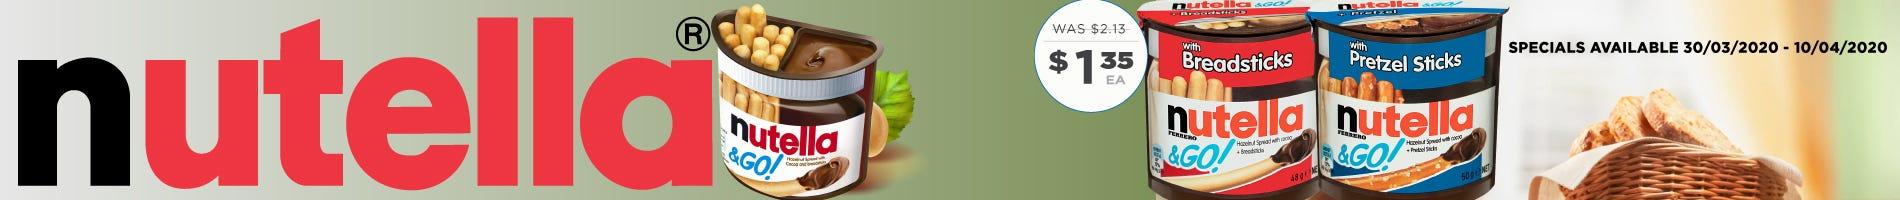 Click to Shop Nutella & Go